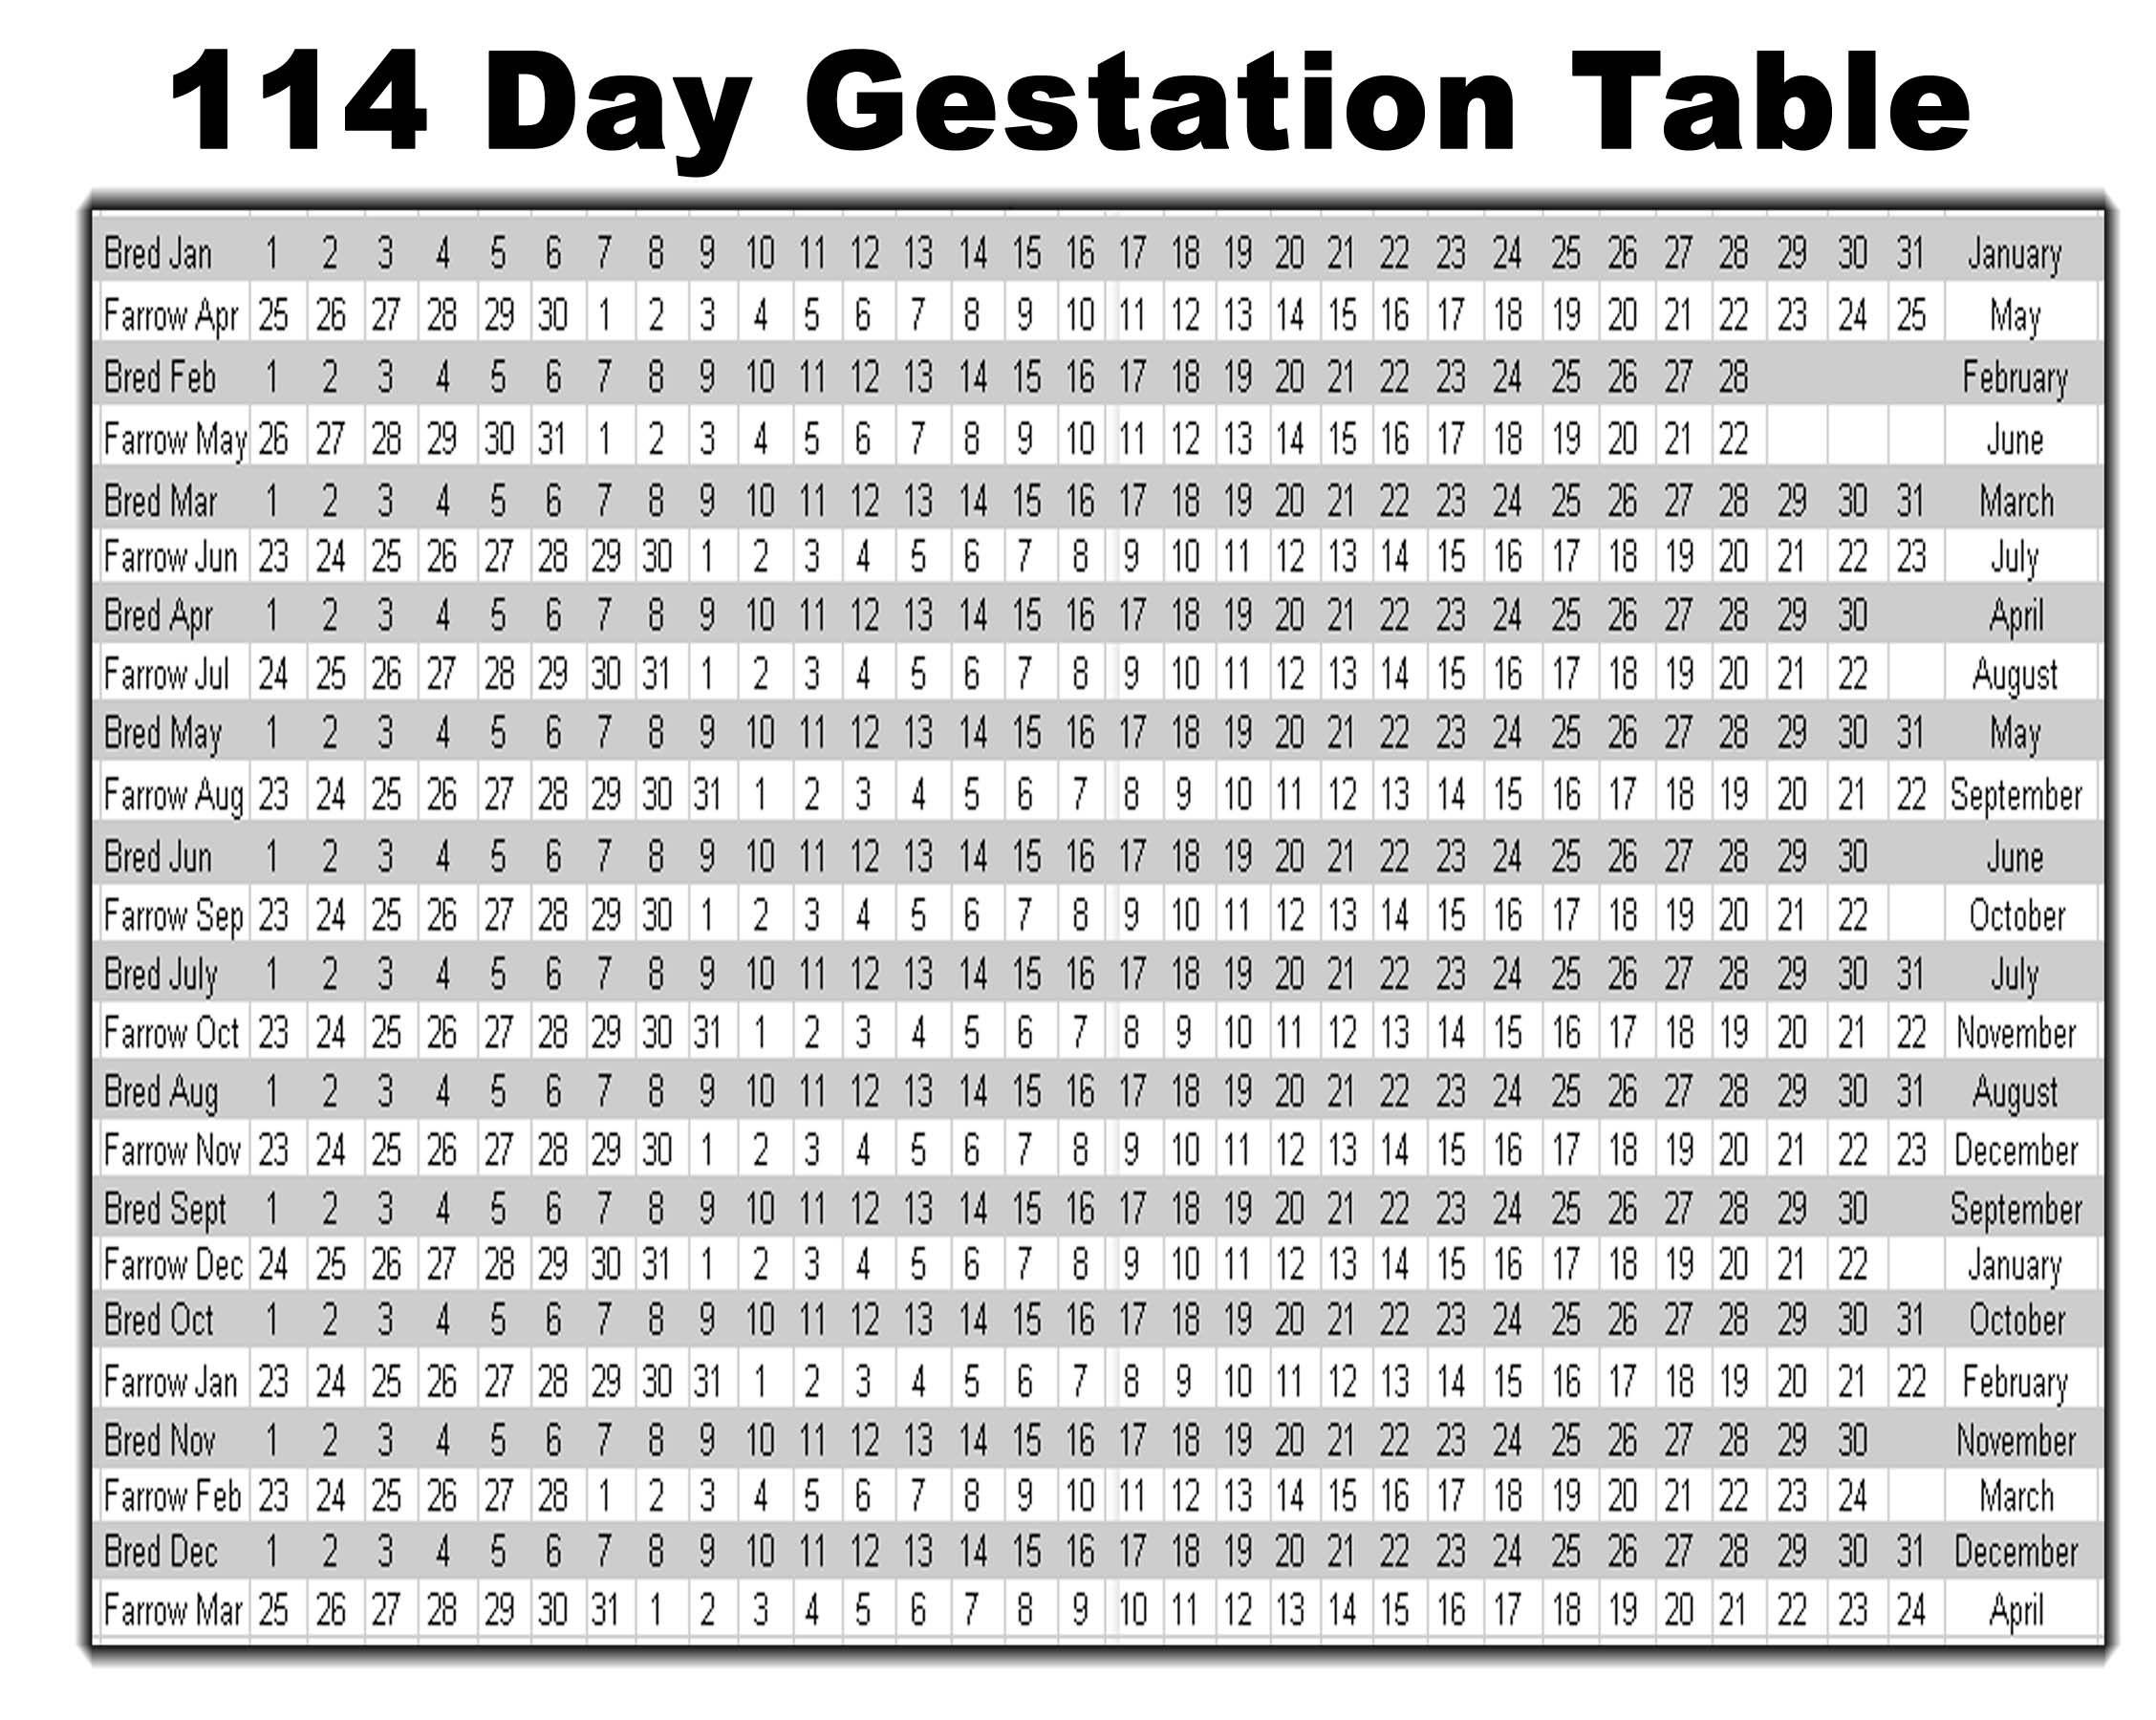 Swine/Pig Gestation Table source:www.triplesires.com ... - photo#8